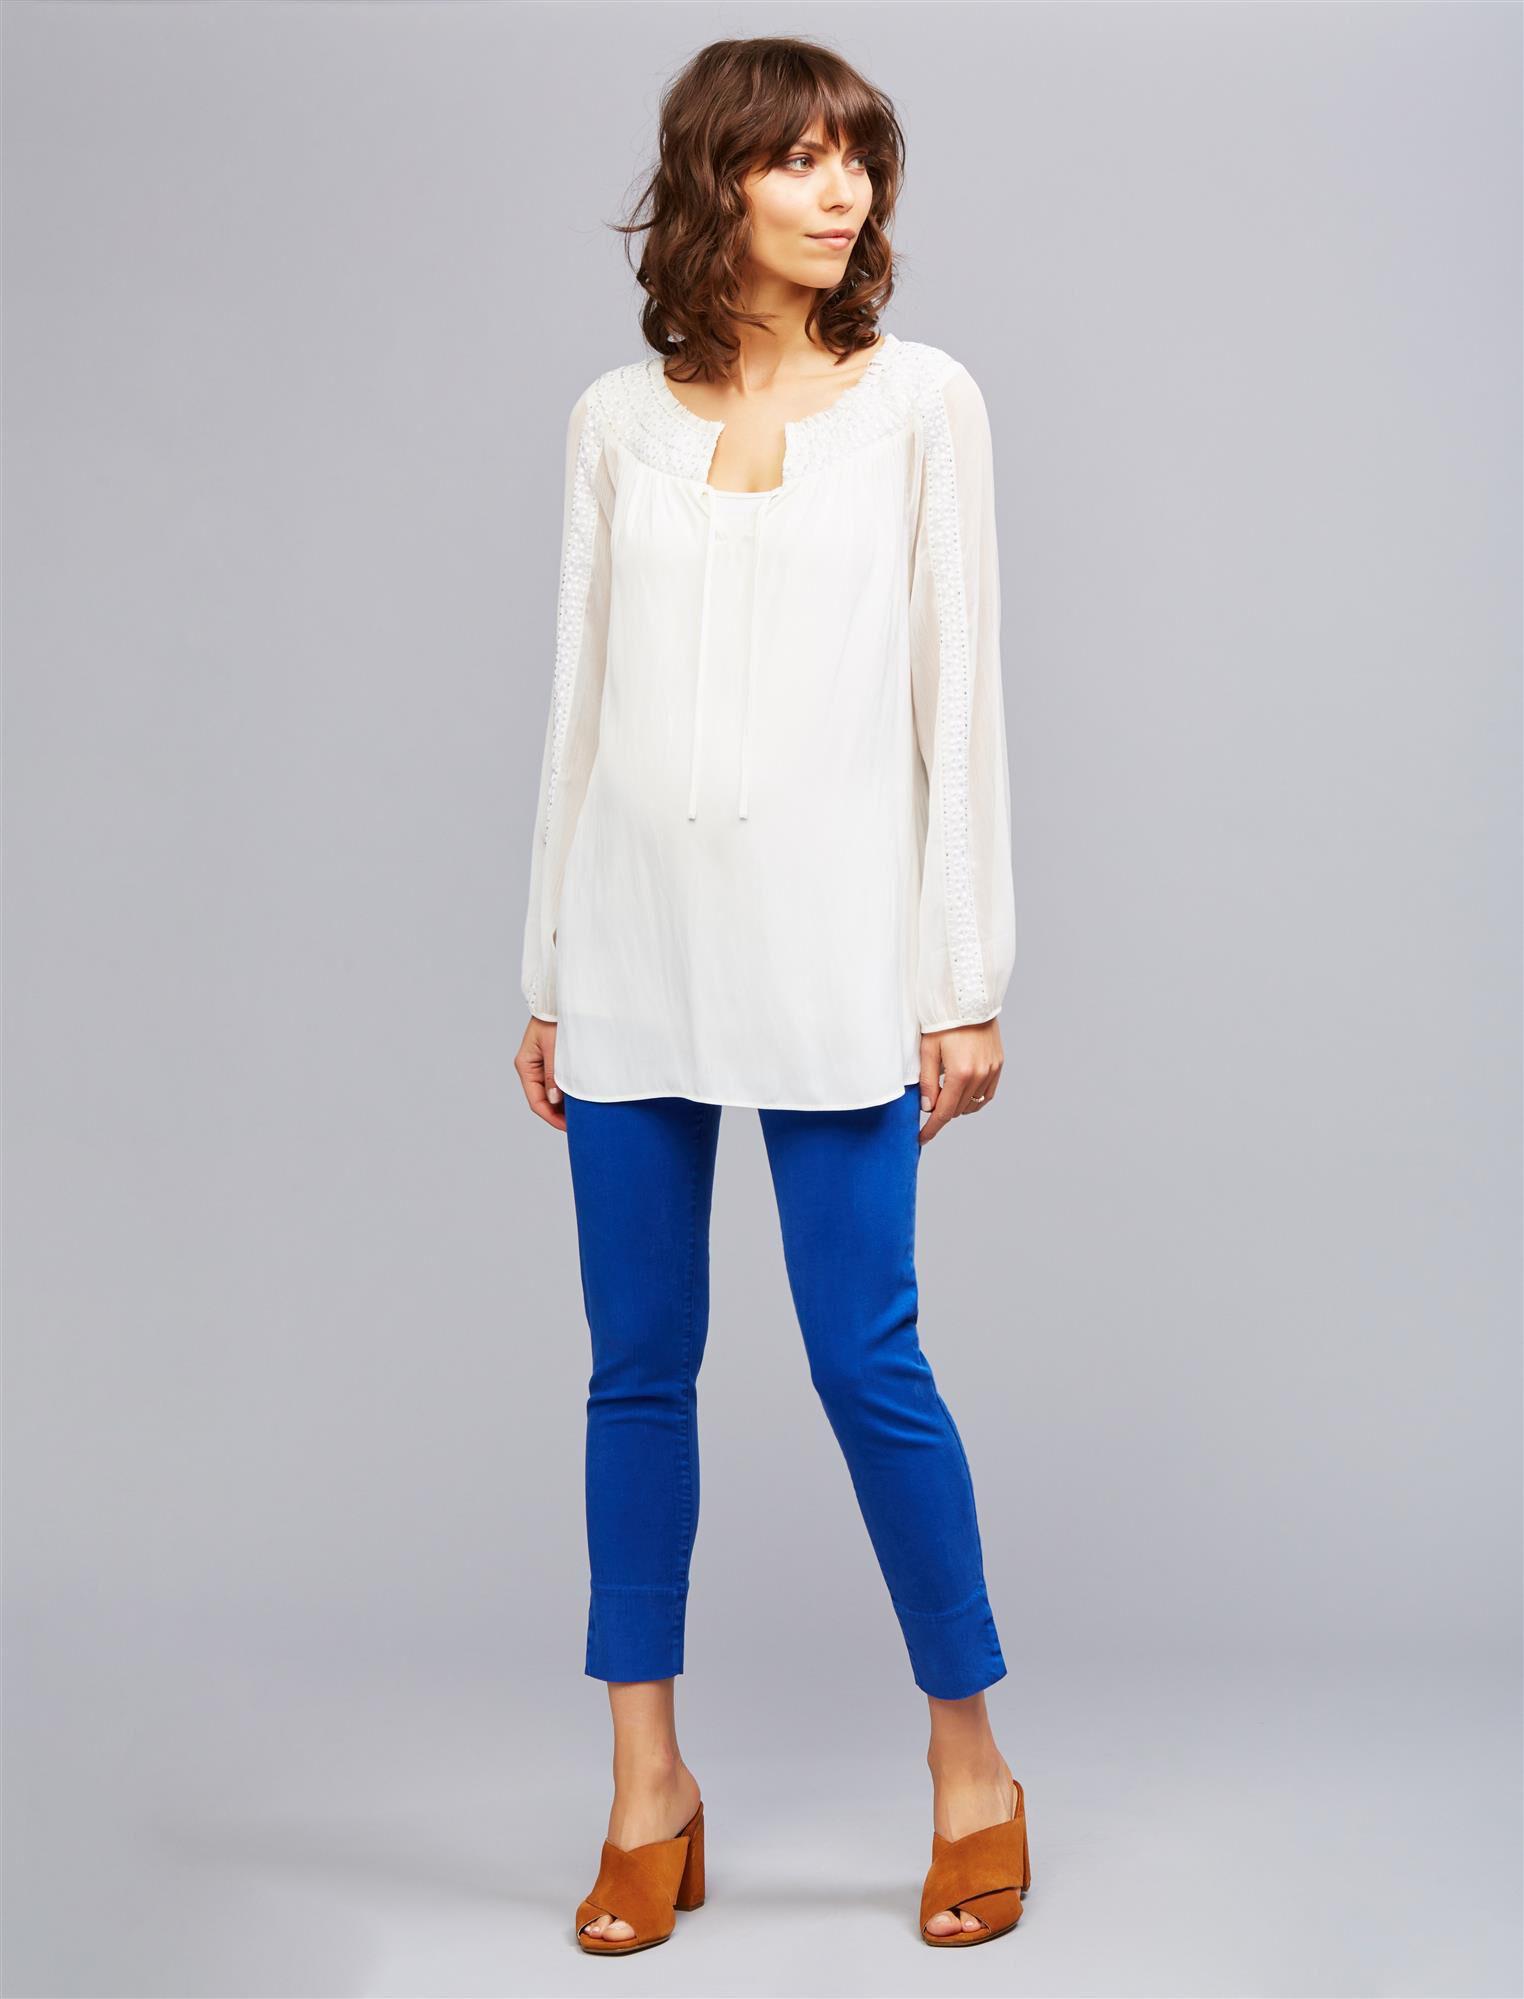 Luxe Essentials Denim Secret Fit Belly Twill Skinny Leg Maternity Pants